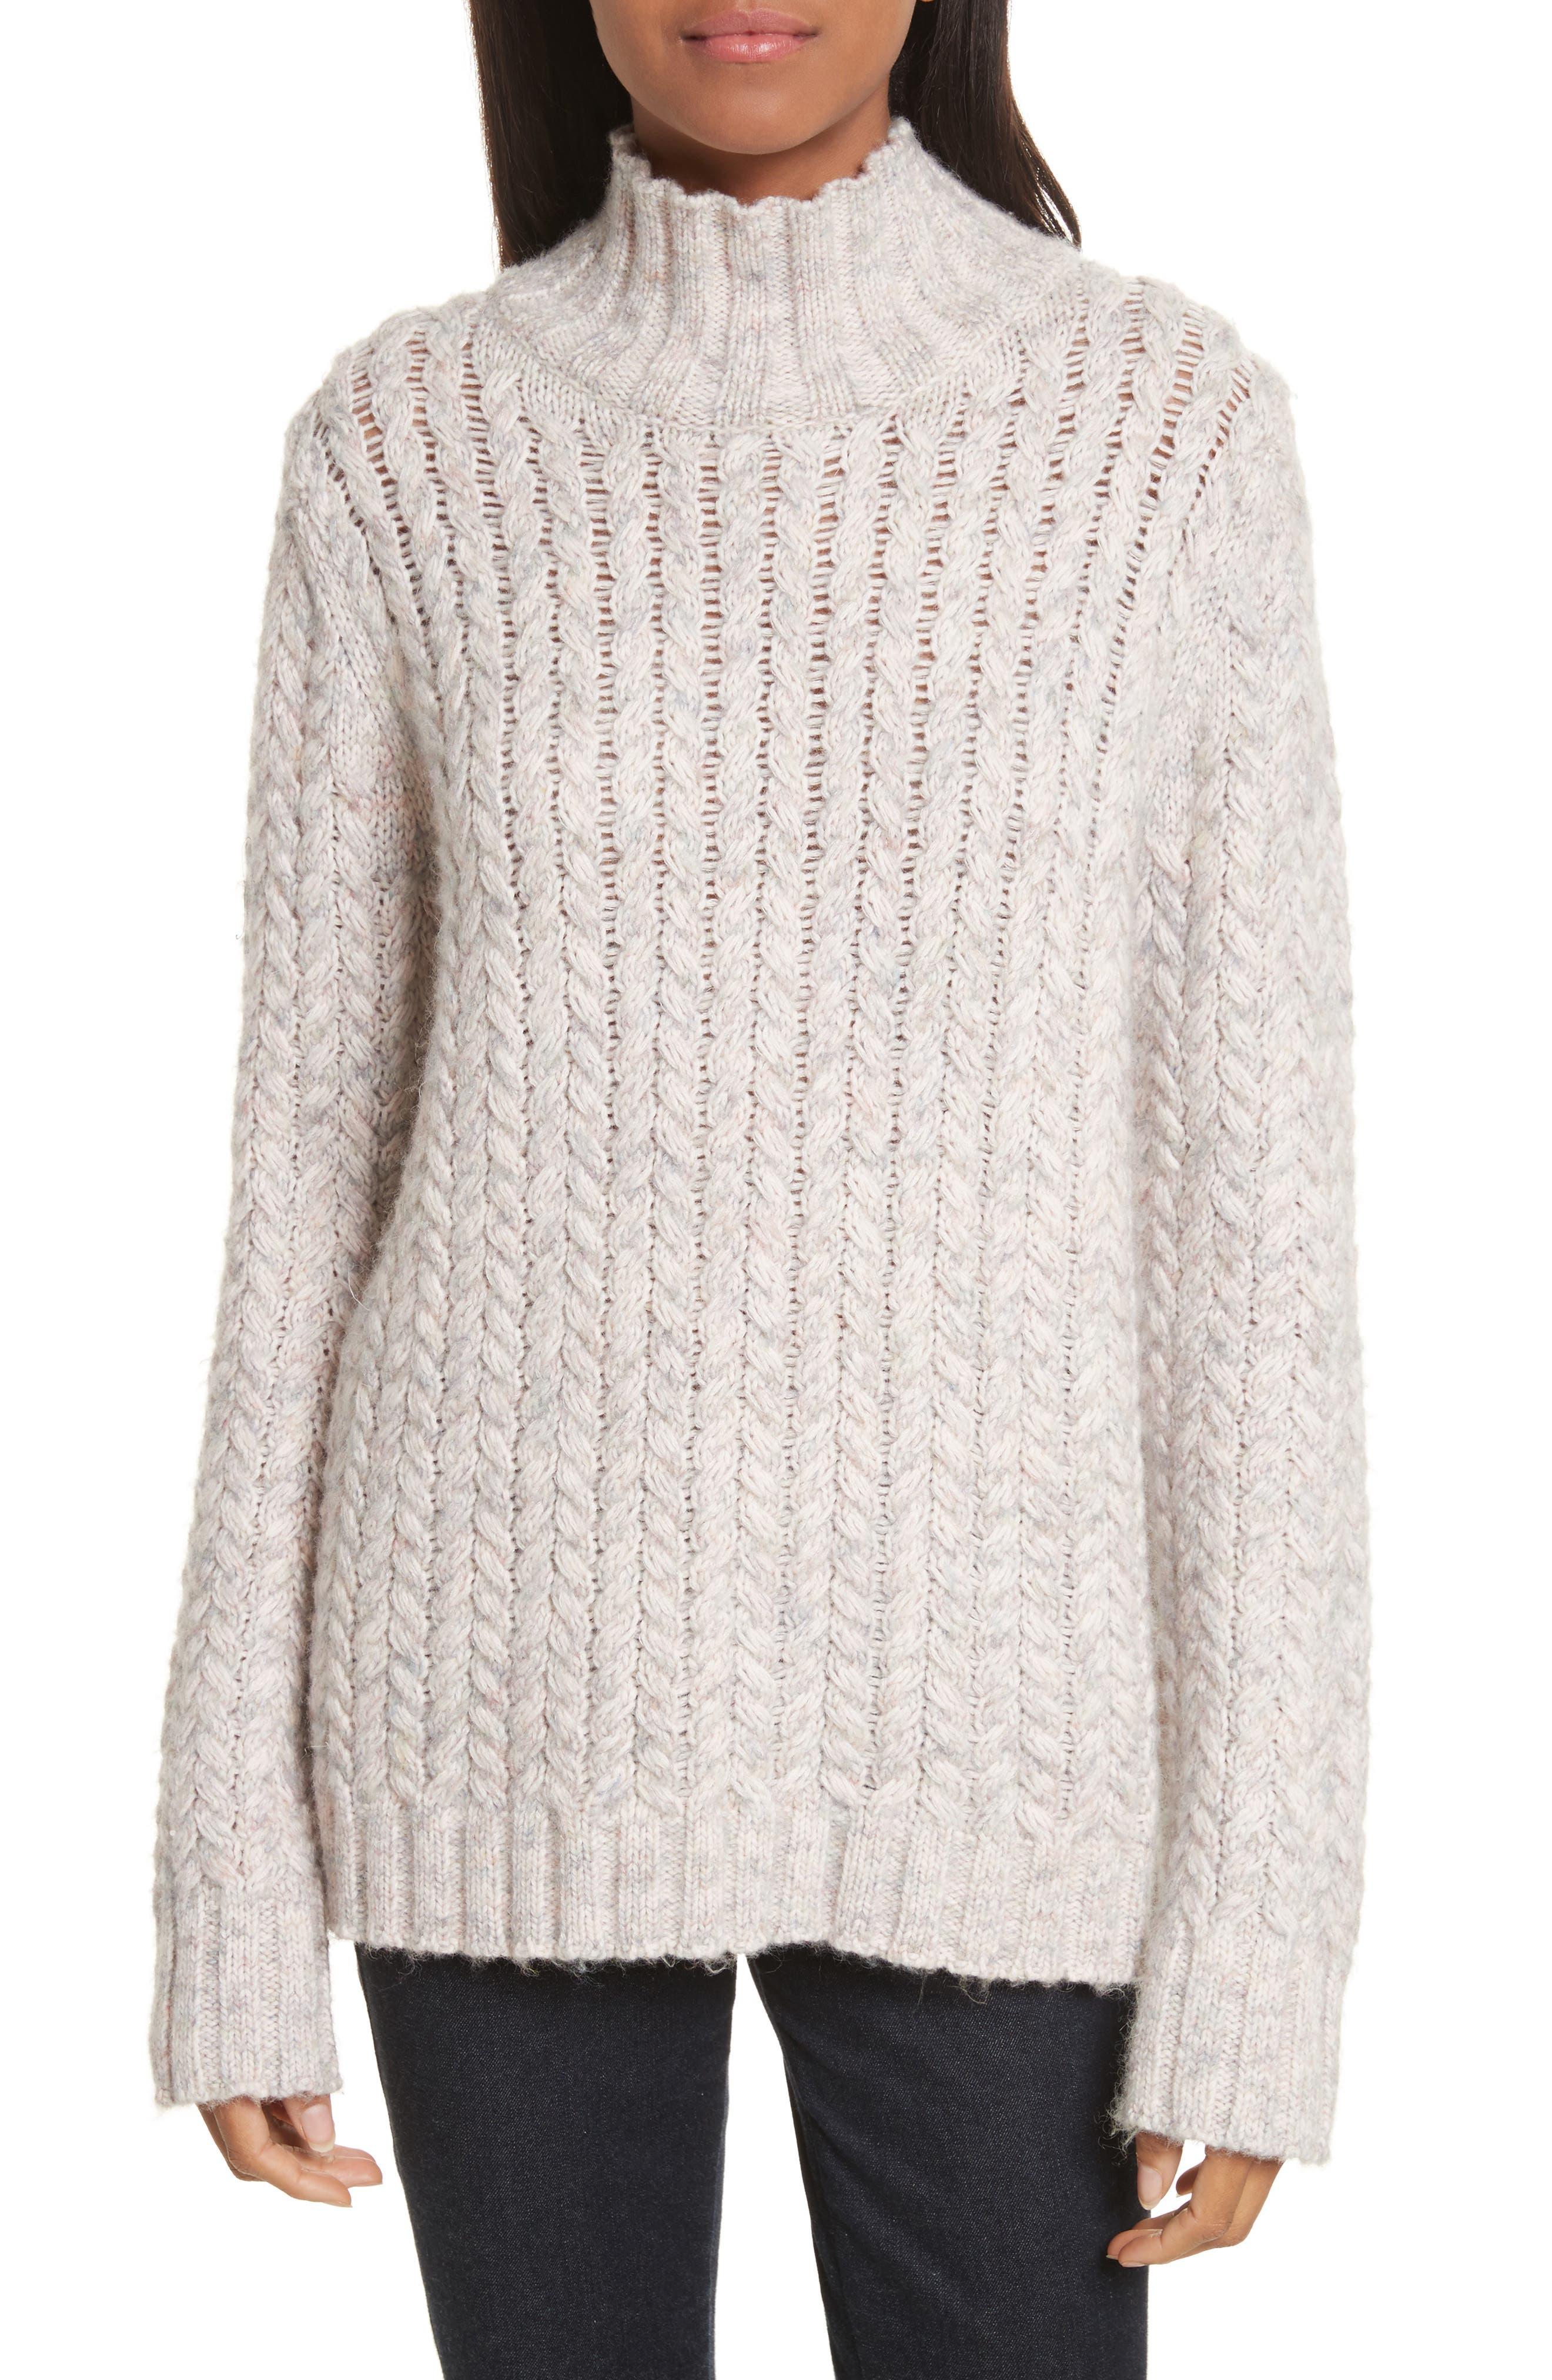 La Vie Rebecca Taylor Marled Cable Knit Pullover